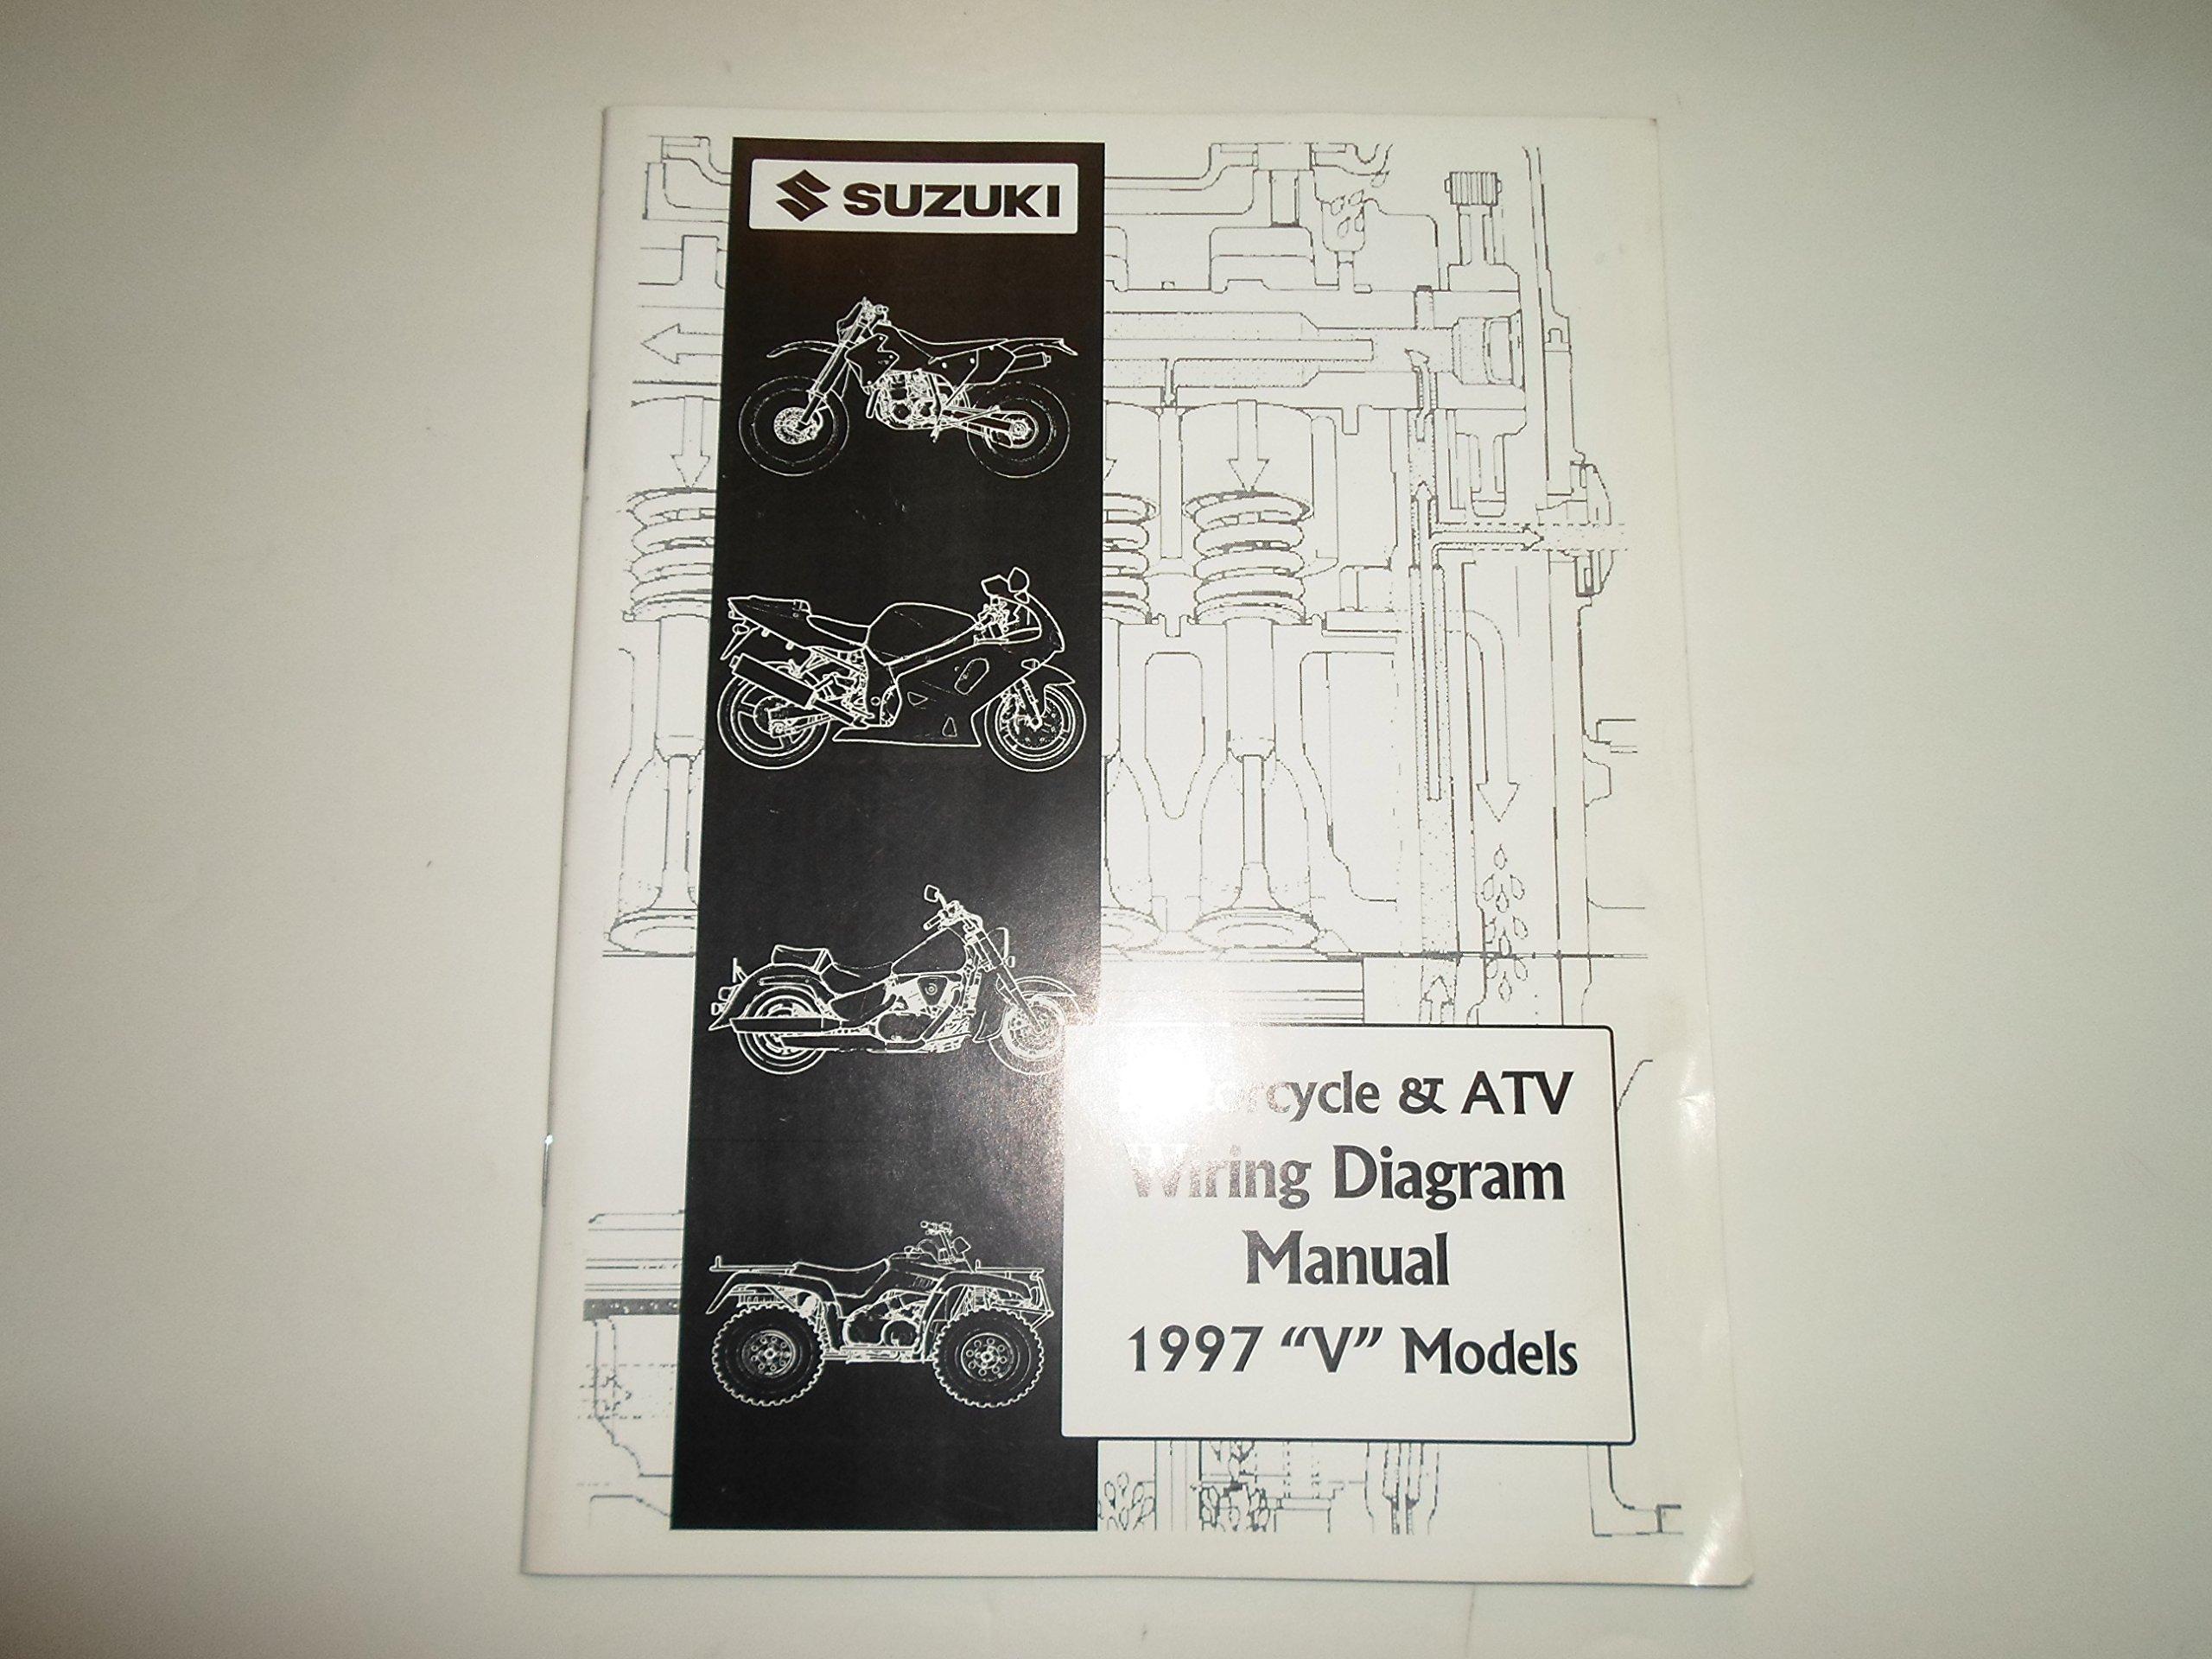 1997 Suzuki Motorcycle Atv Wiring Diagram V Manual Suzuki Automotive Literature Amazon Com Books